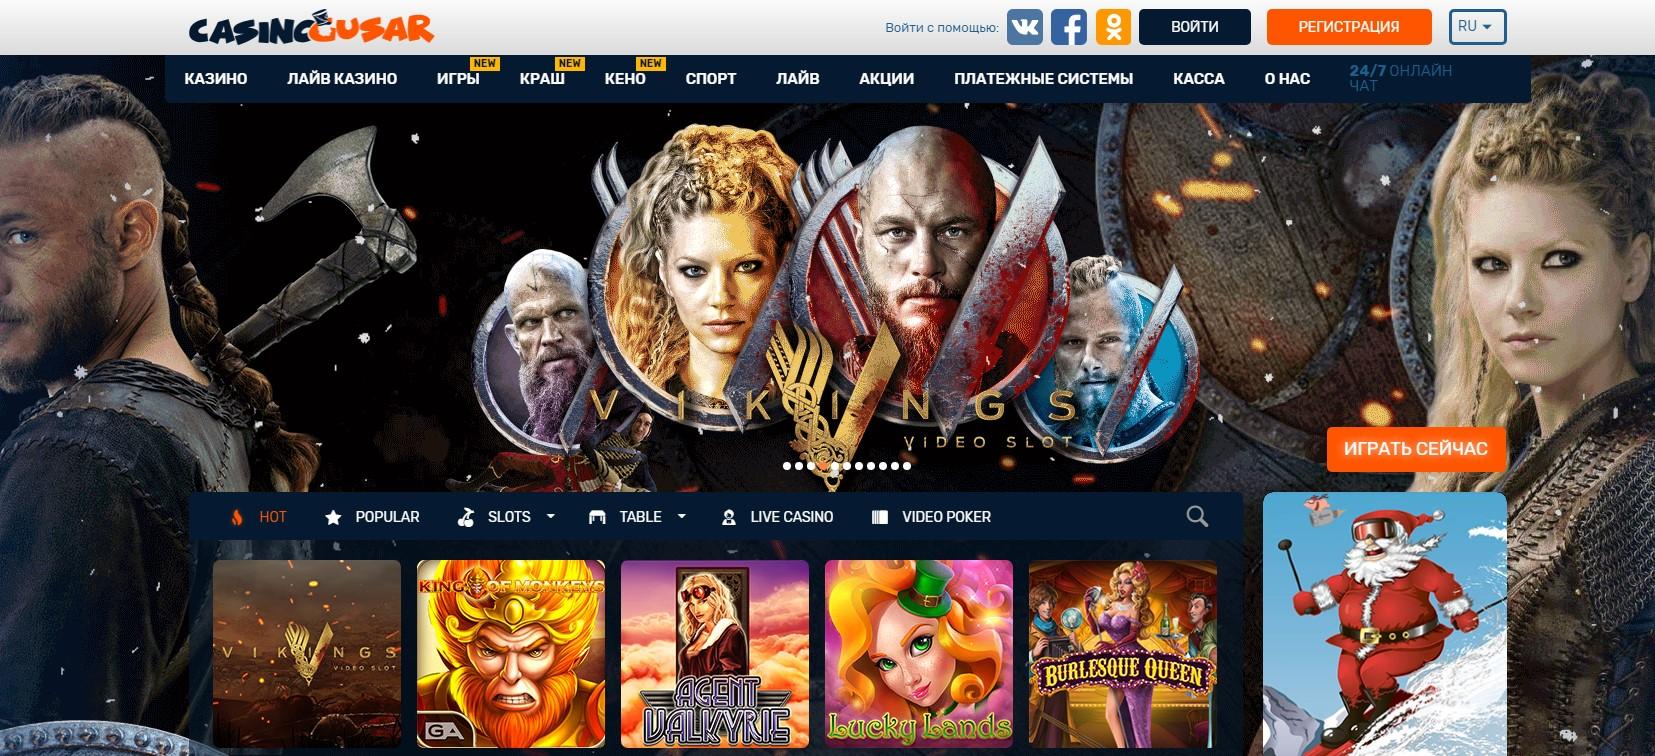 Fortune Clock - Официальный сайт